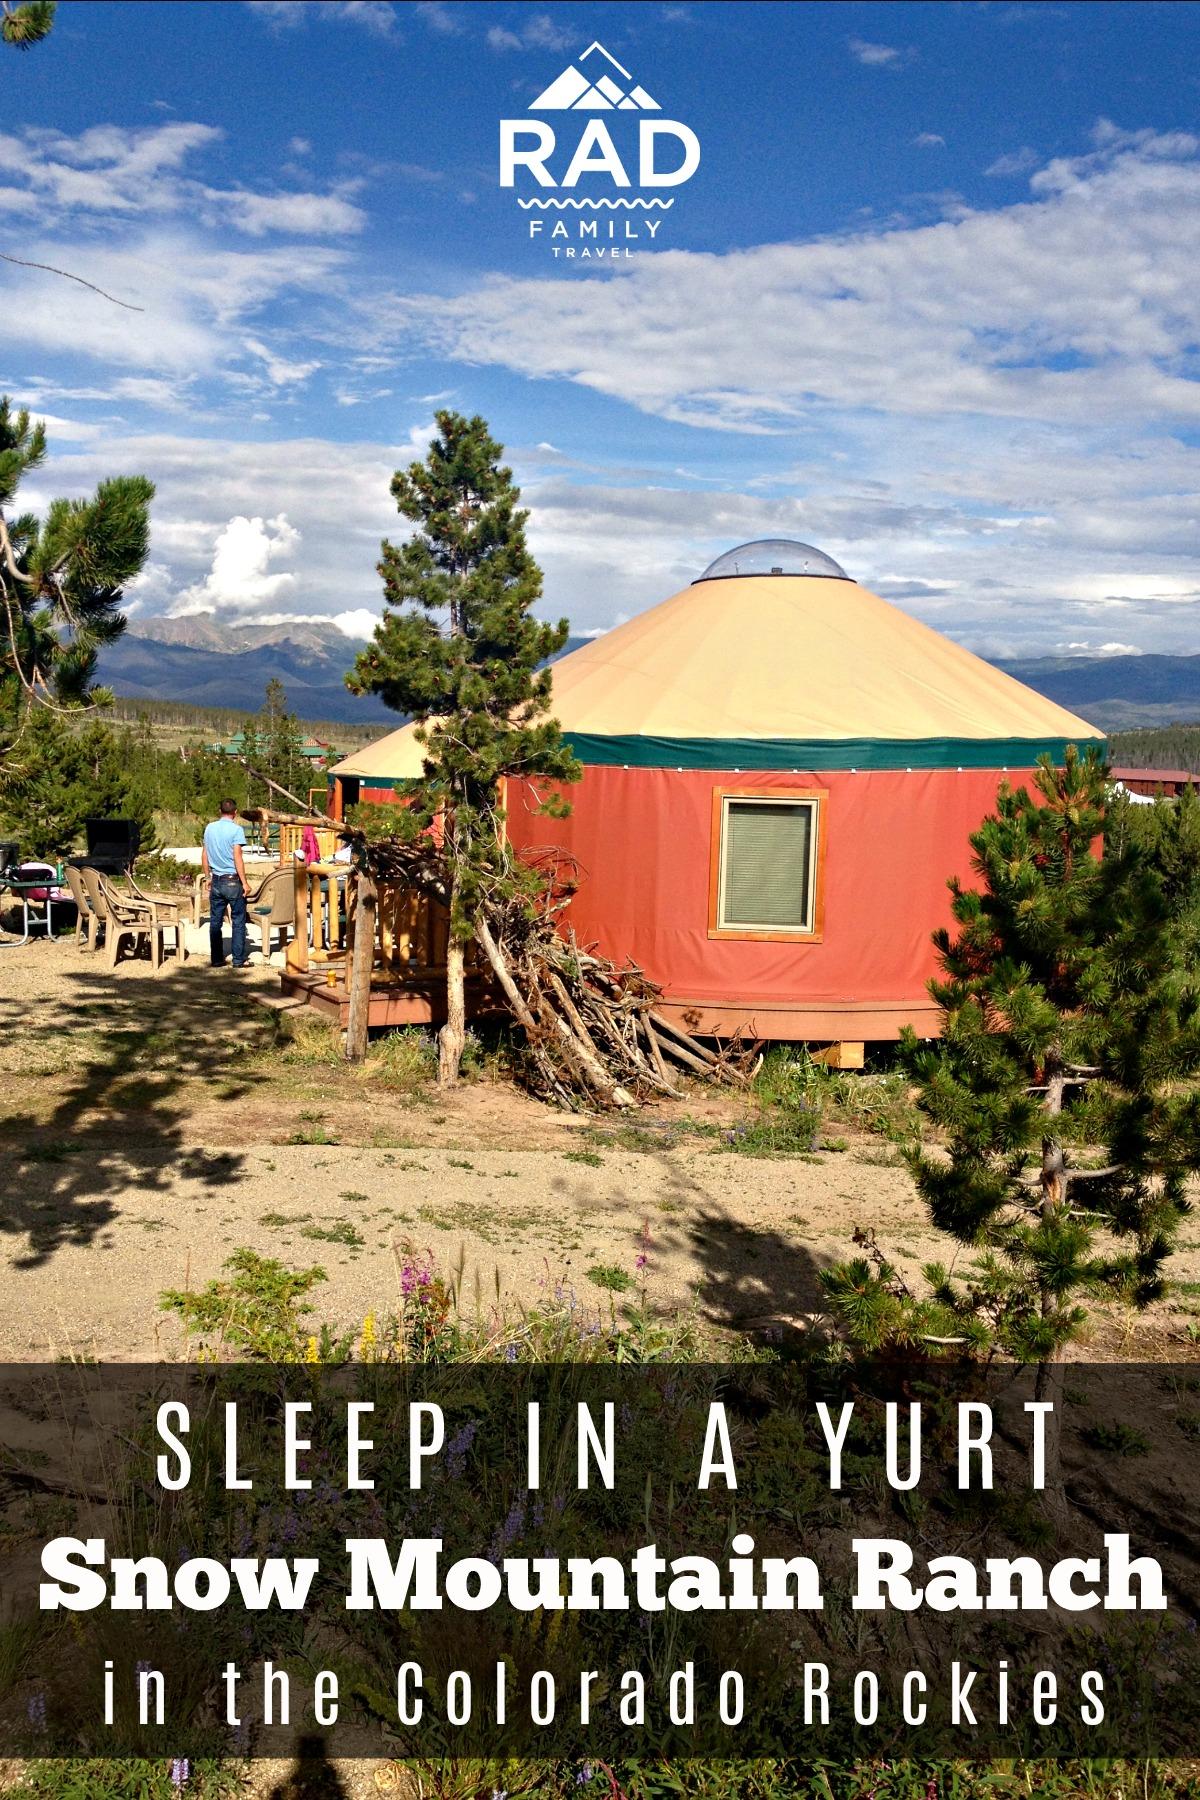 snow mountain ranch yurts